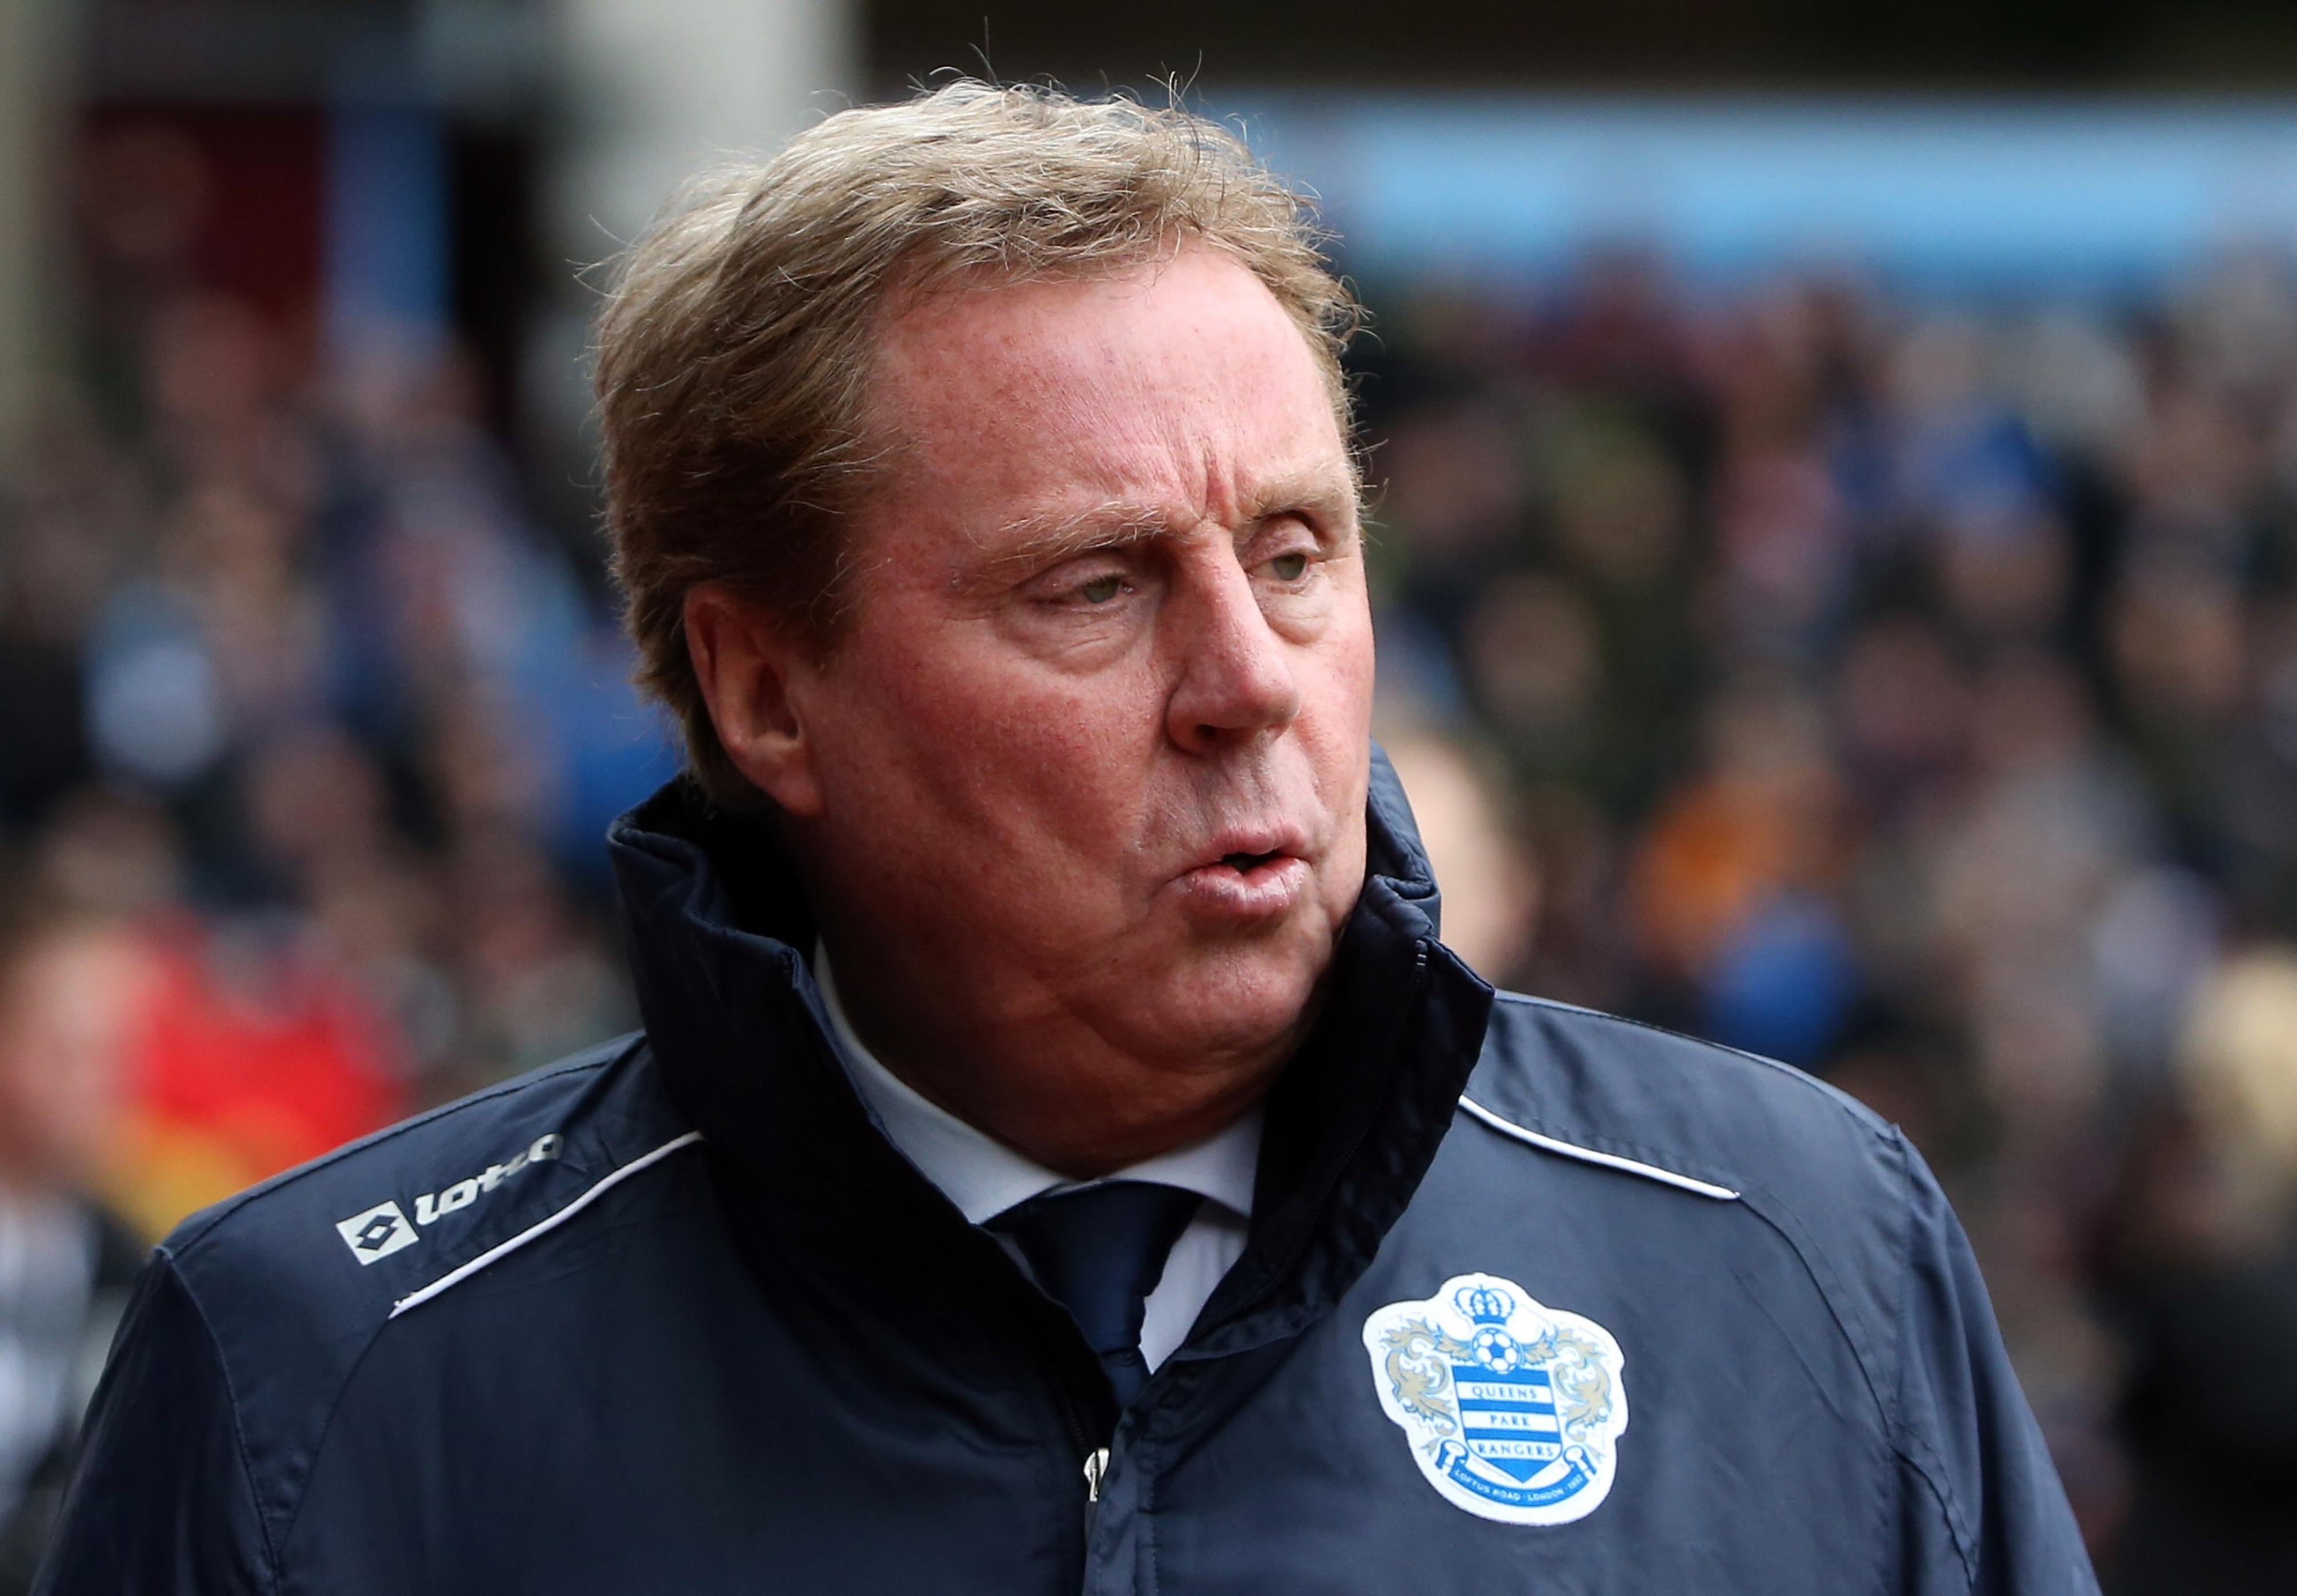 Premier League, Week 31: Queens Park Rangers implode against Fulham